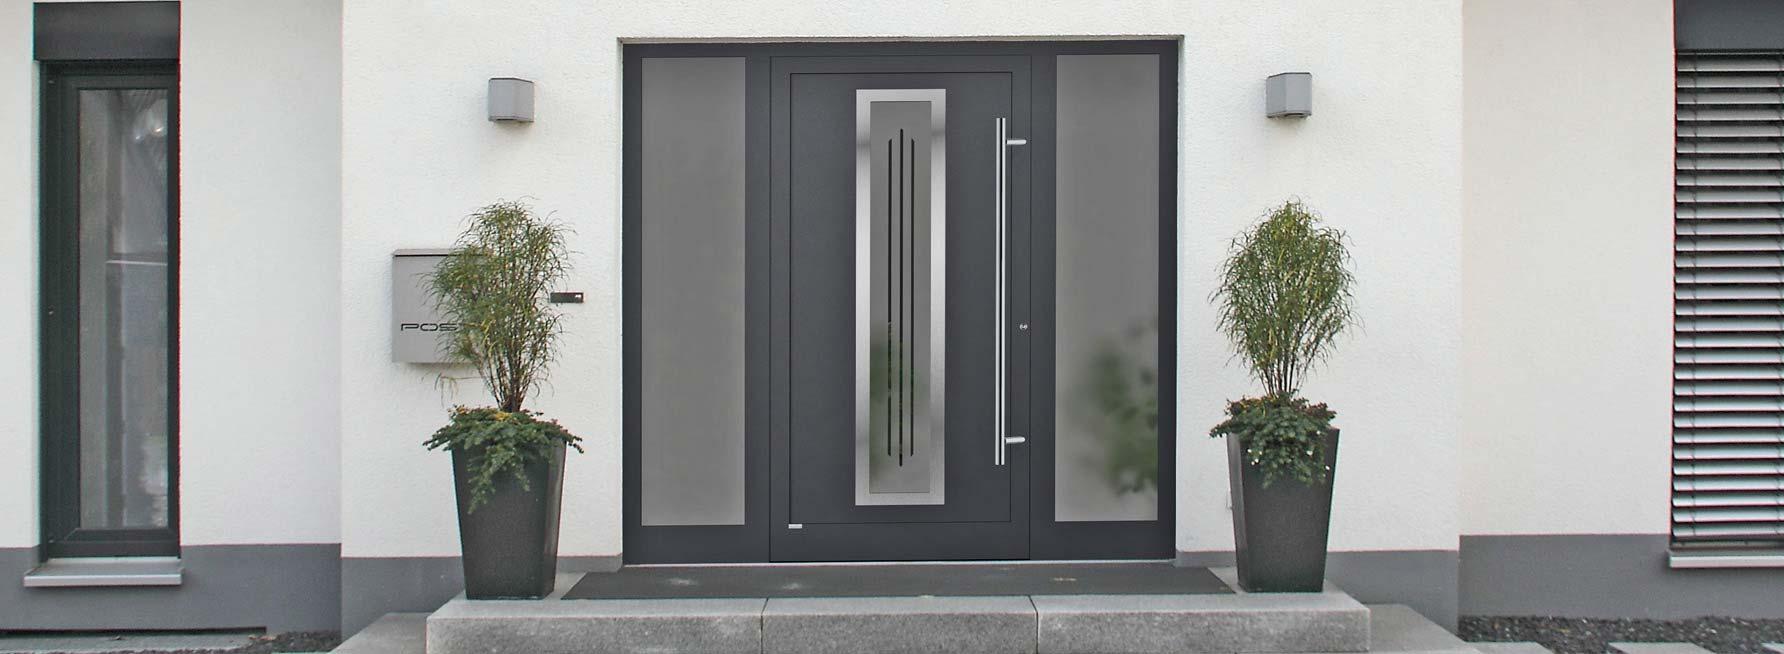 Eingangstüren modern  Türen - StylBau